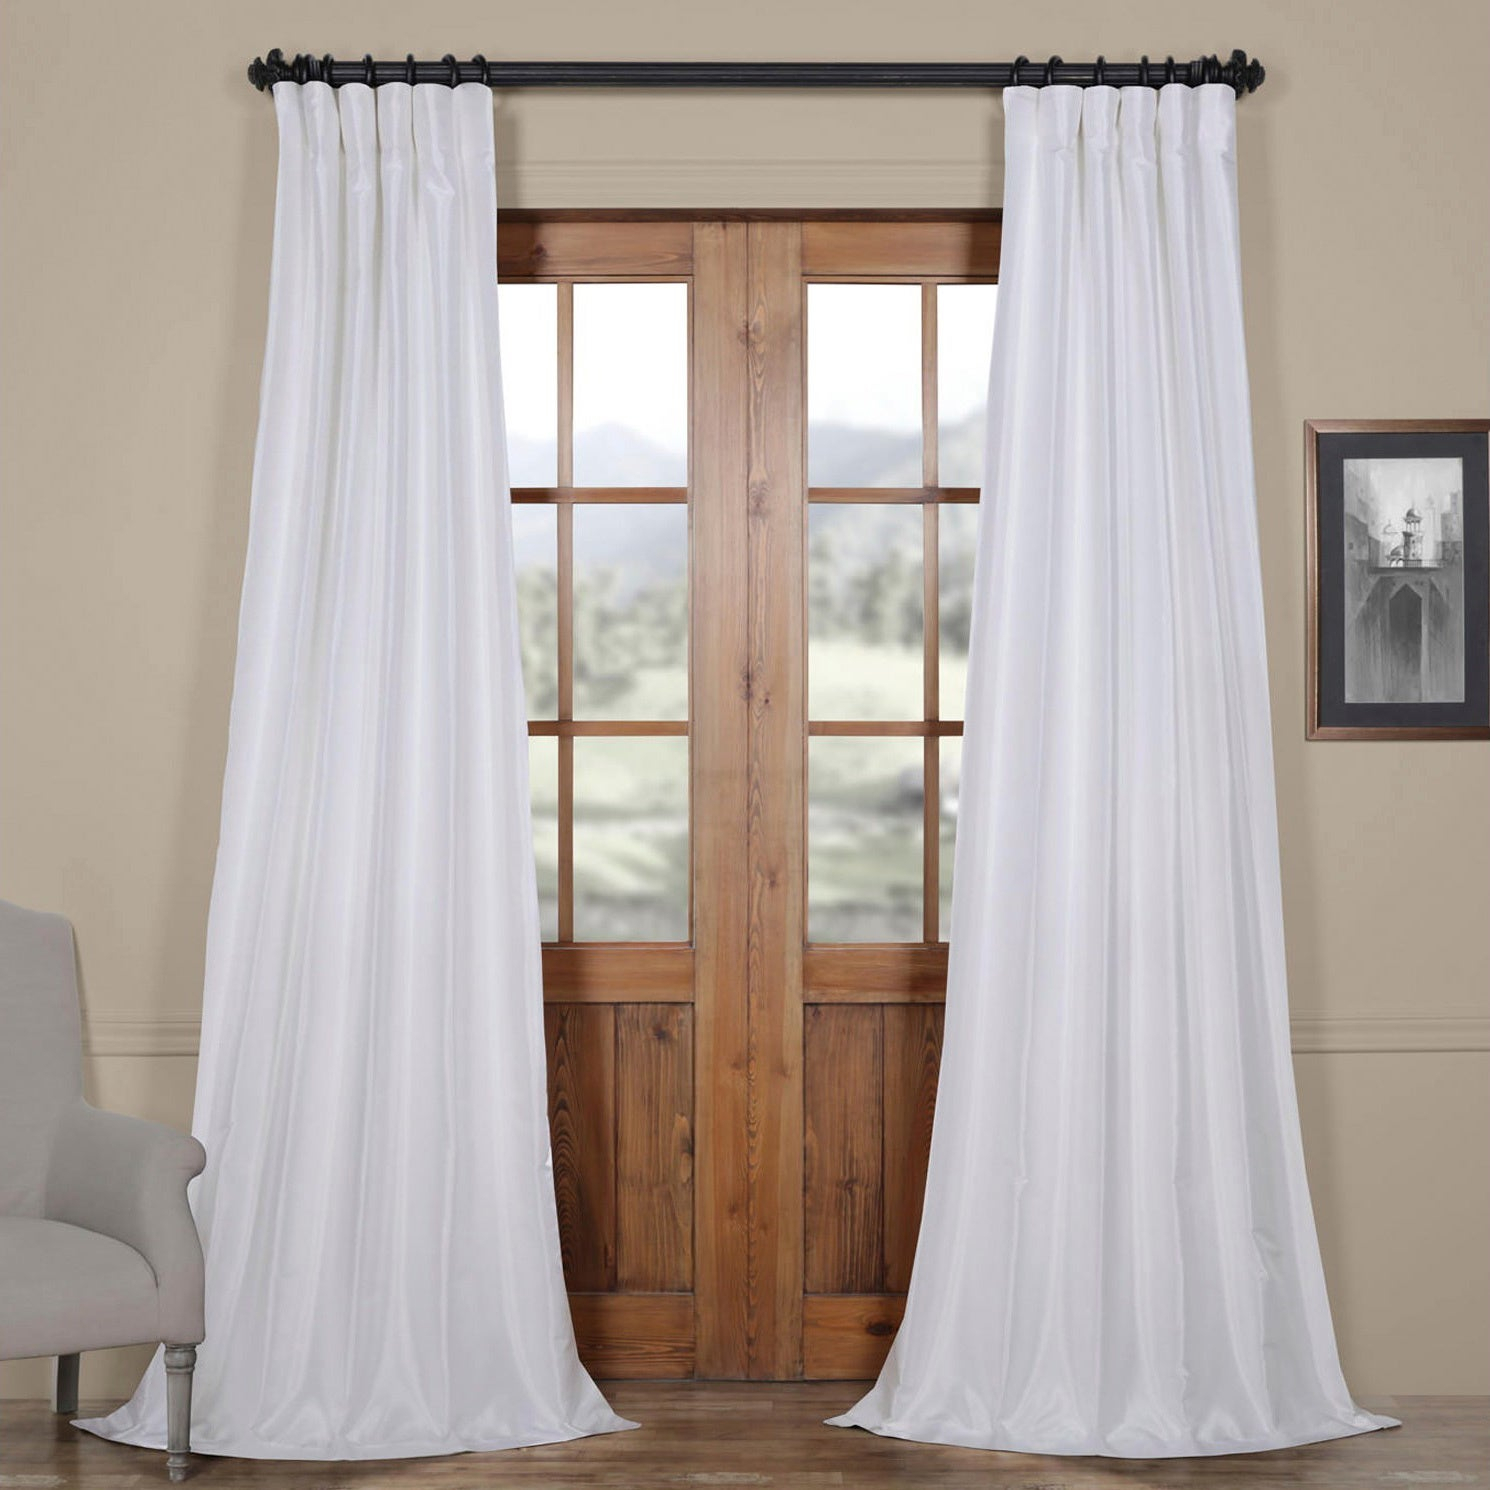 Ice White Vintage Faux Textured Dupioni Silk 108L Curtain Panel Inside Storm Grey Vintage Faux Textured Dupioni Single Silk Curtain Panels (View 24 of 30)